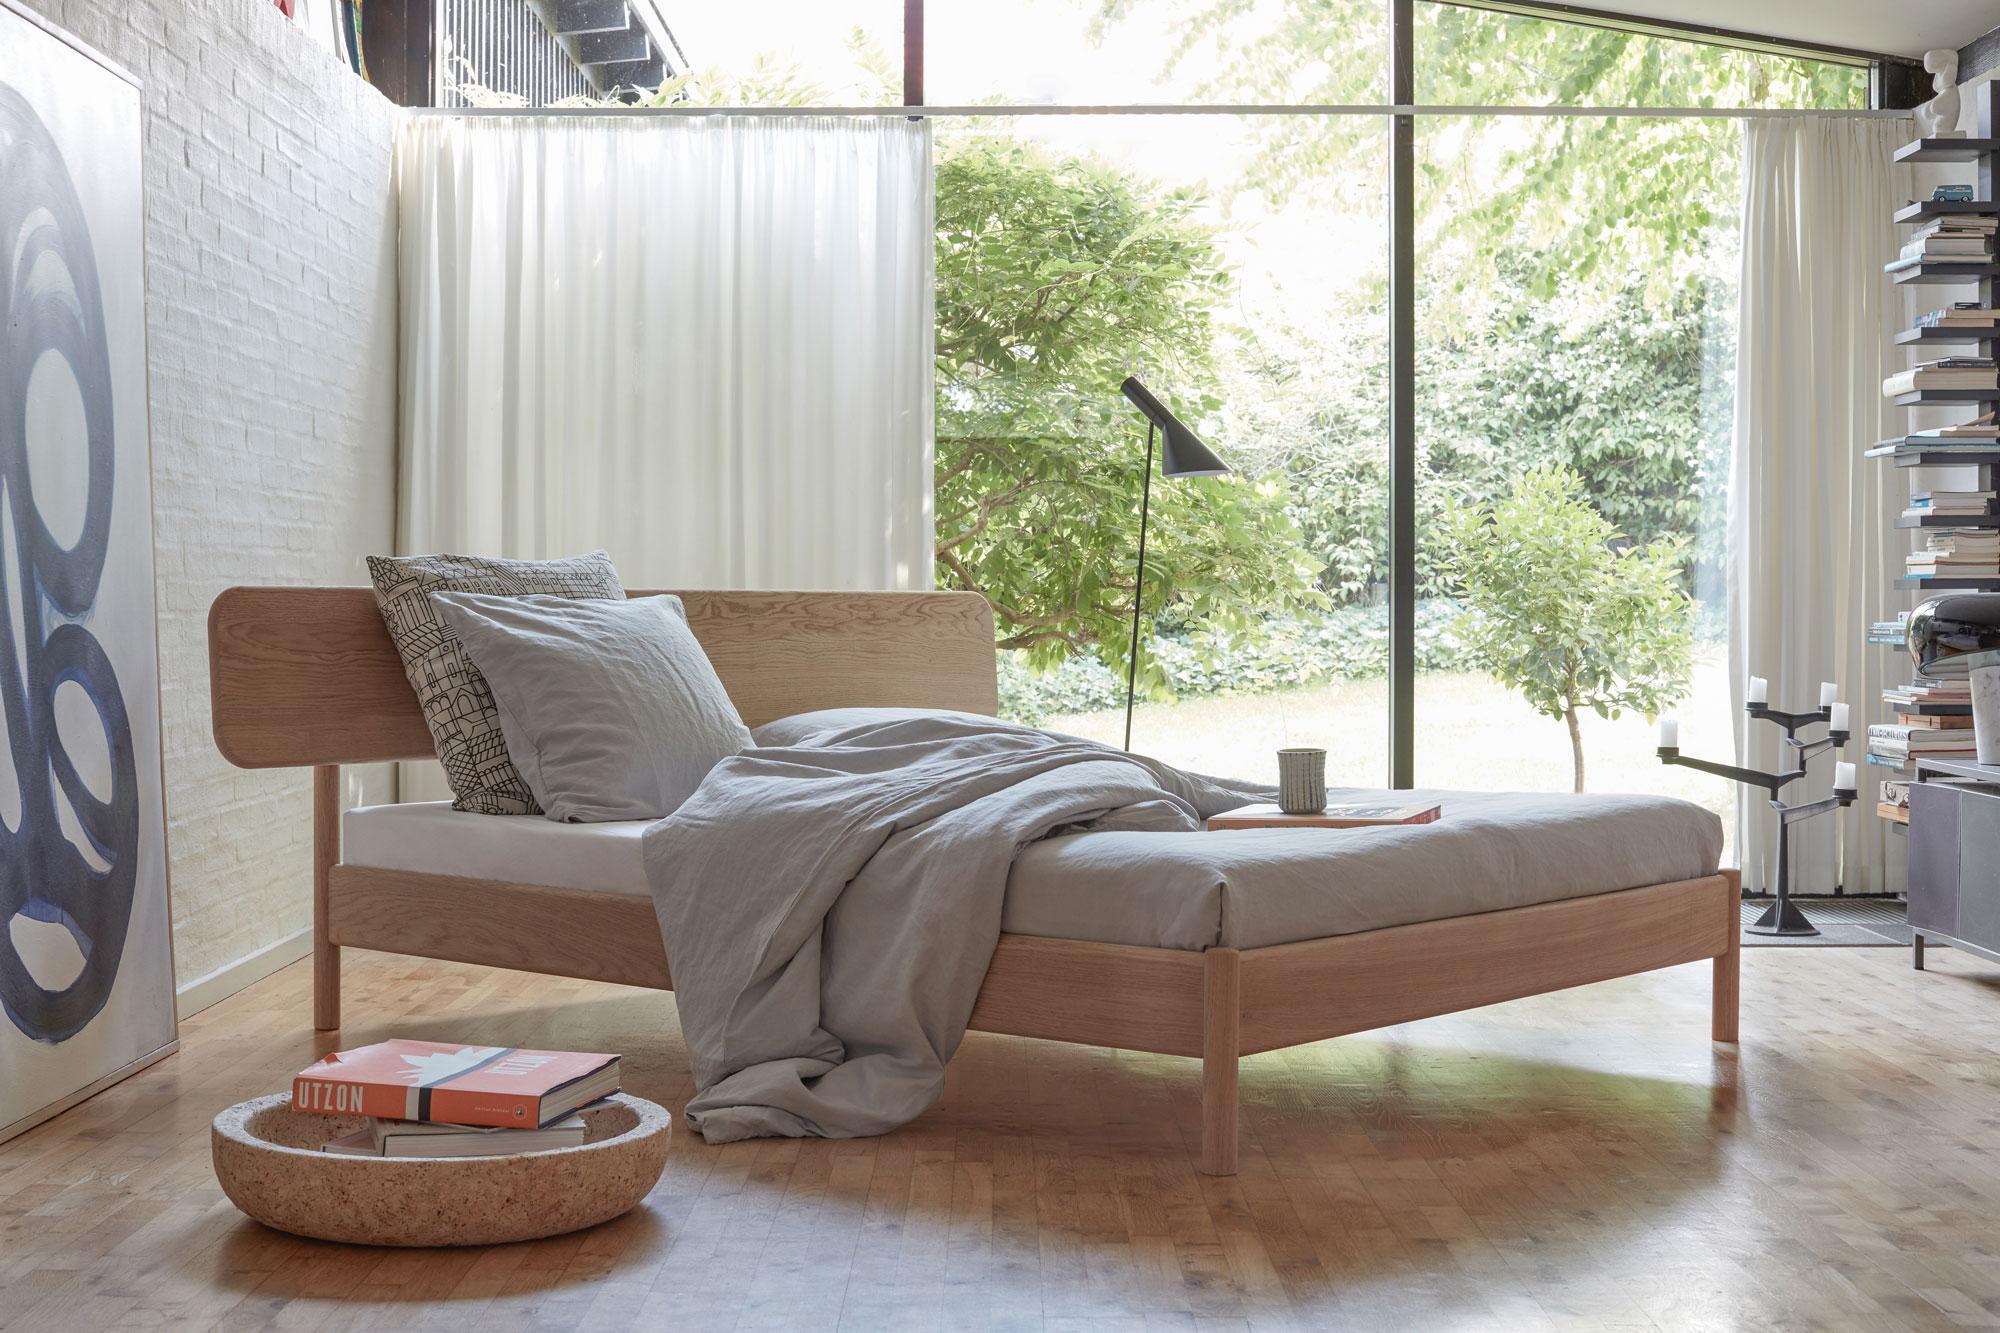 03---ALKEN-BED---RE-BEDS---DESIGN-BY-OLIVER-&-LUKAS-WEISSKROGH.jpg